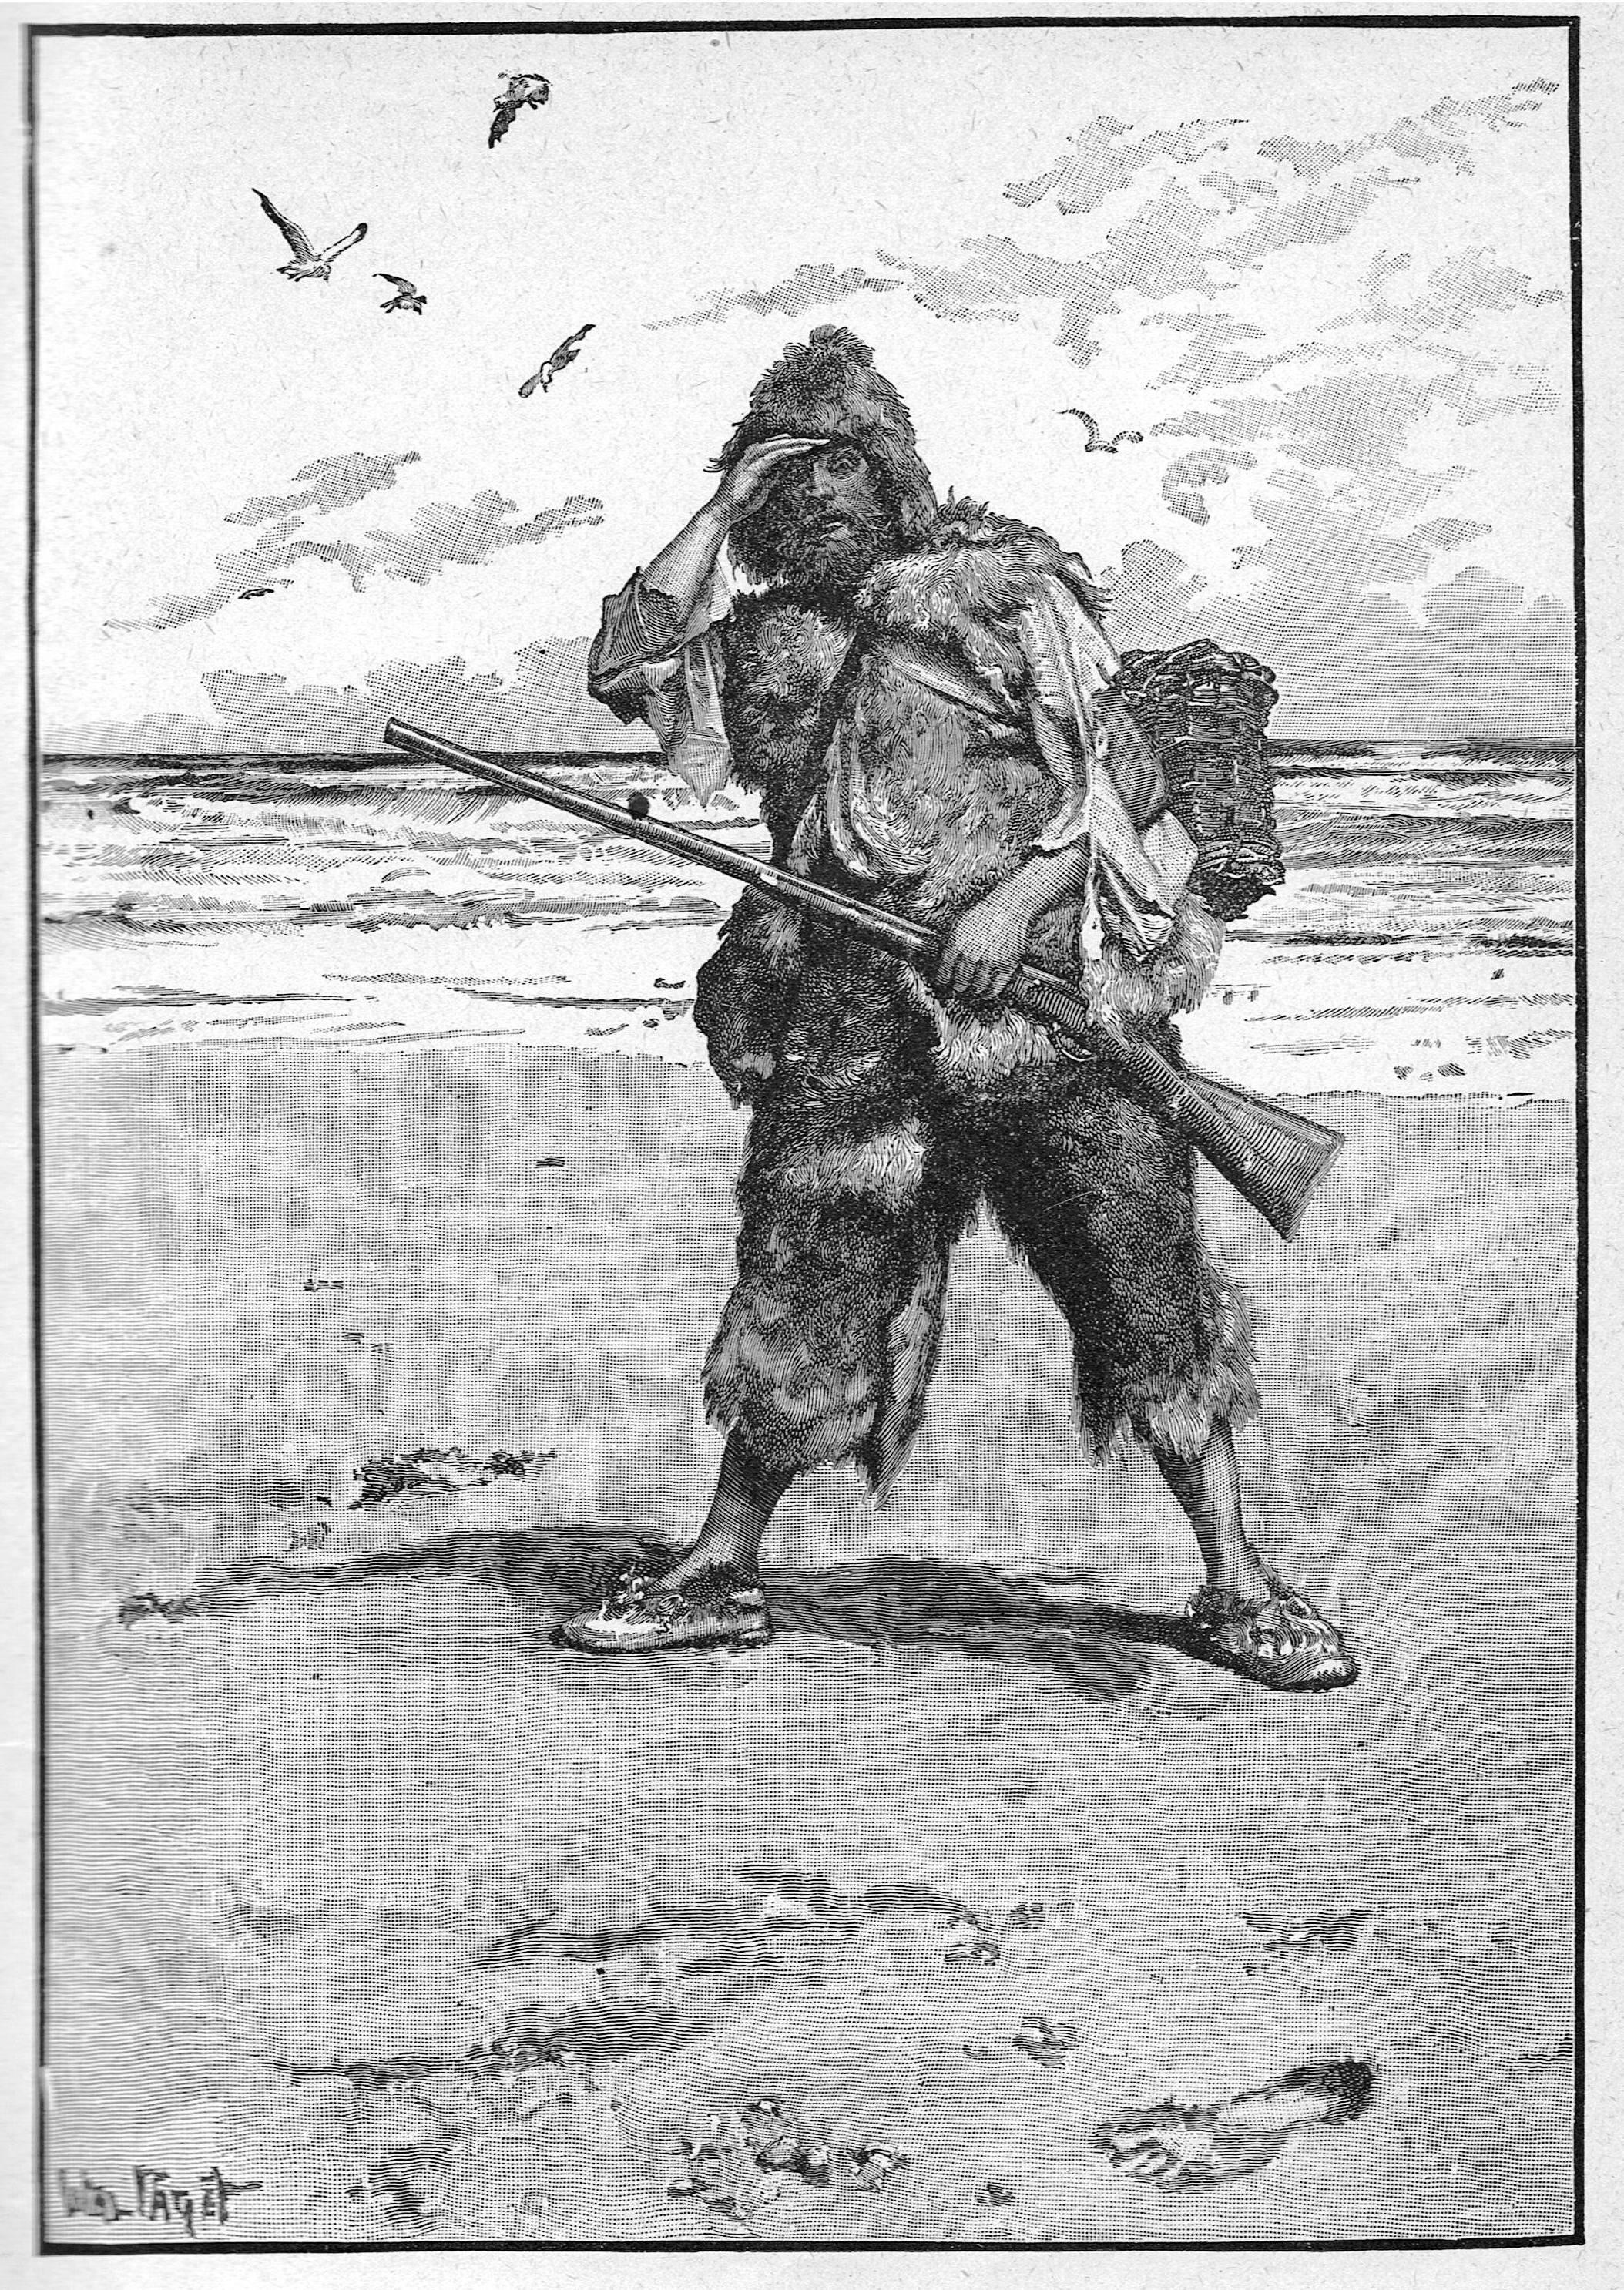 robinson crusoe Complete summary of daniel defoe's robinson crusoe enotes plot summaries cover all the significant action of robinson crusoe.